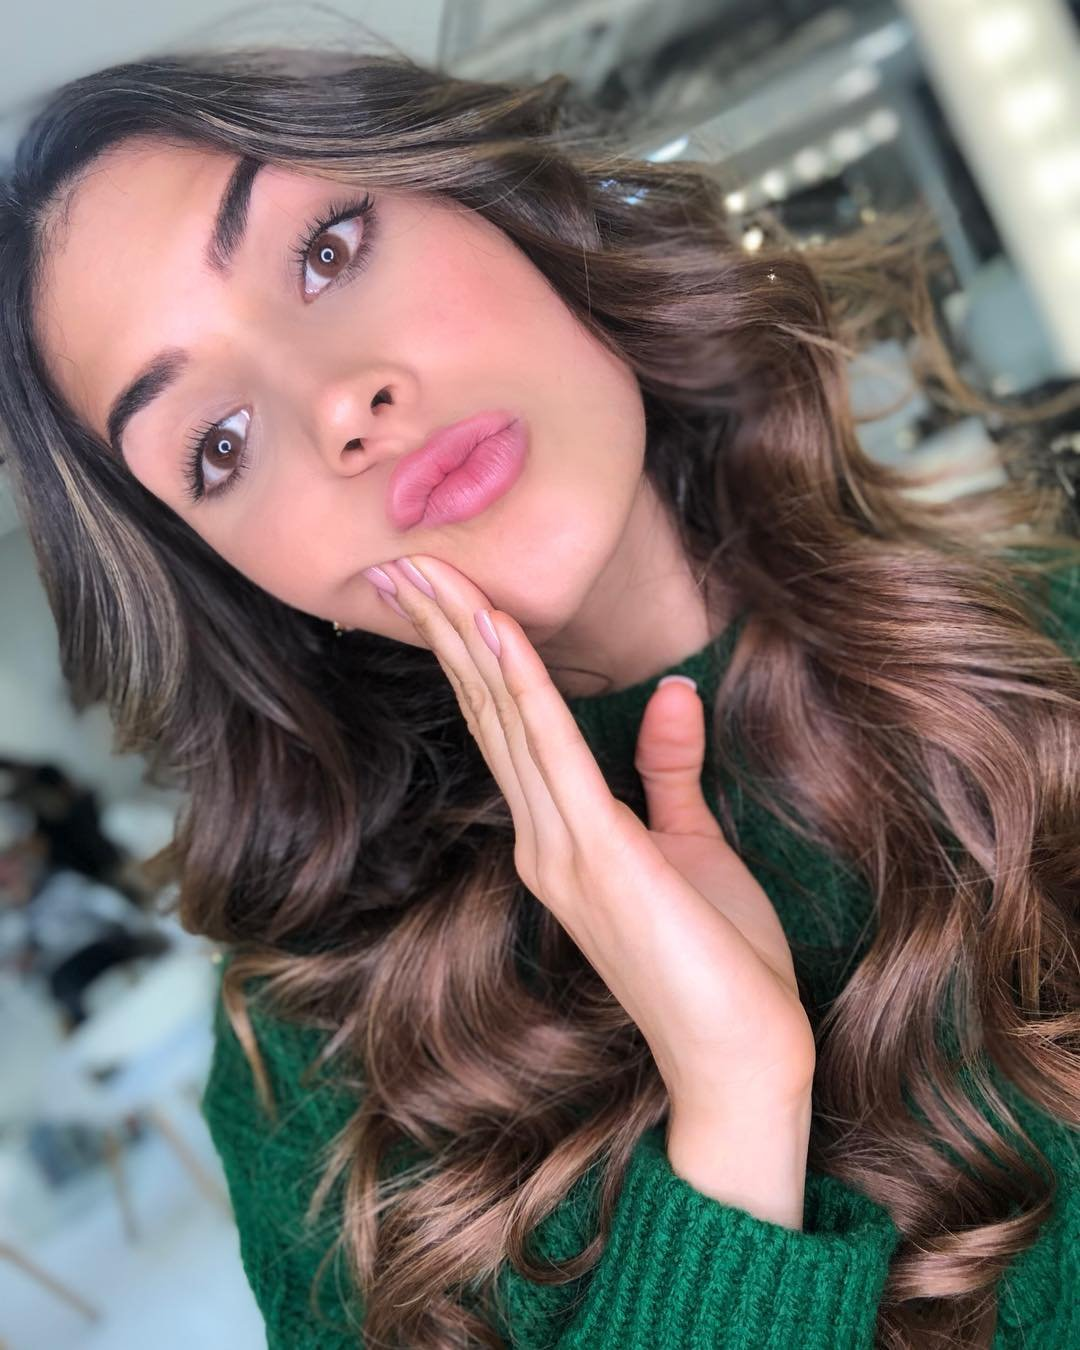 gabriela tafur, top 5 de miss universe 2019. - Página 5 76jcpa10